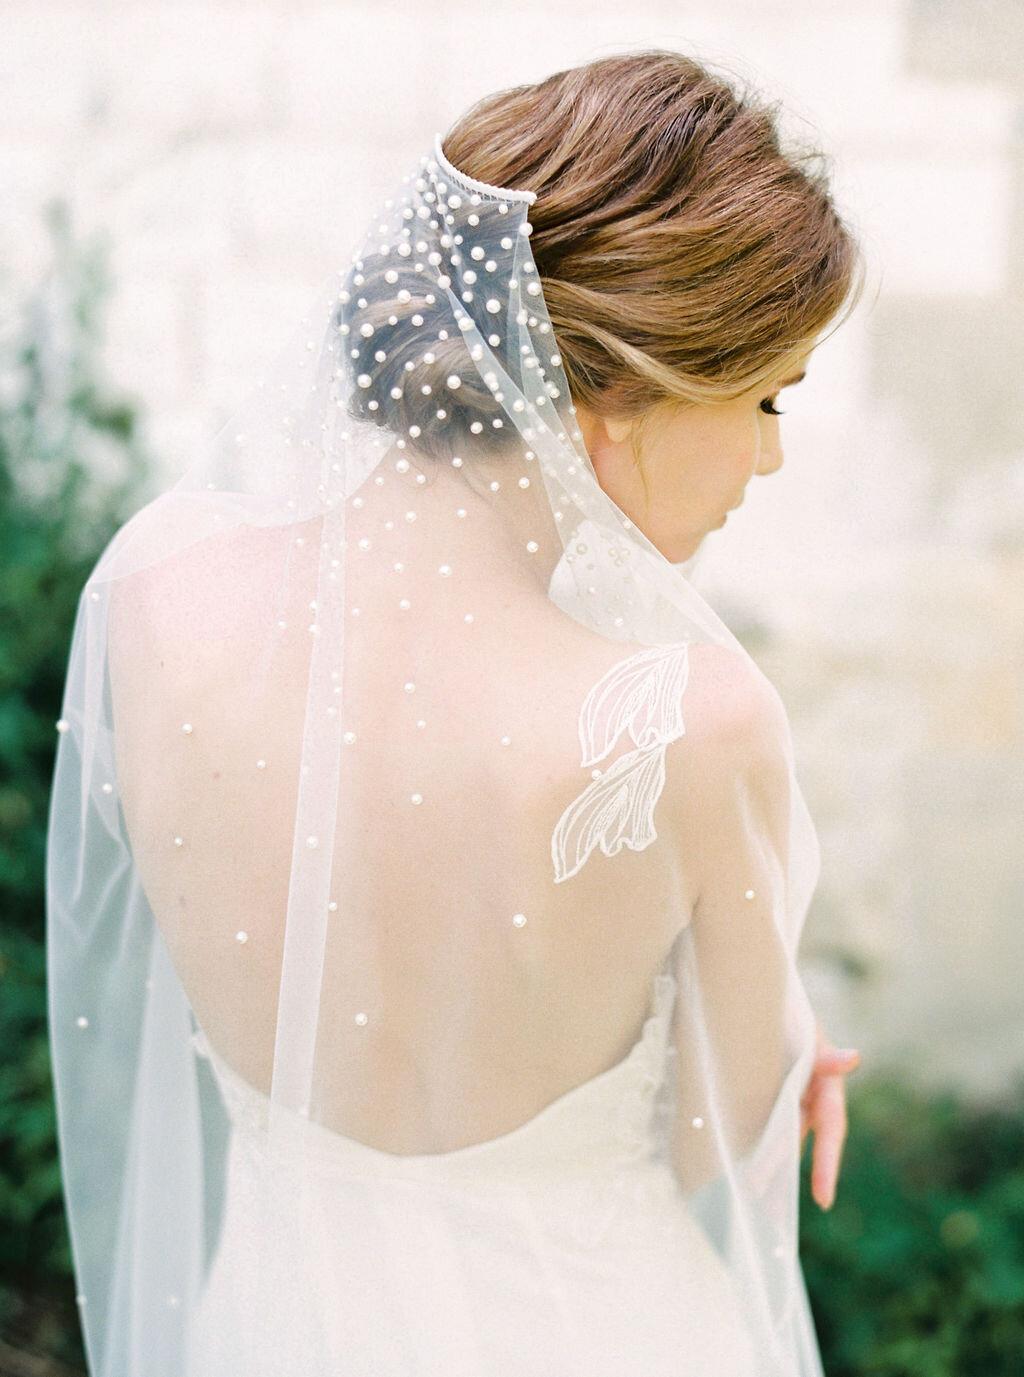 Wedding_Veil_Madame_Tulle_Amelia_Soegijono0036.JPG